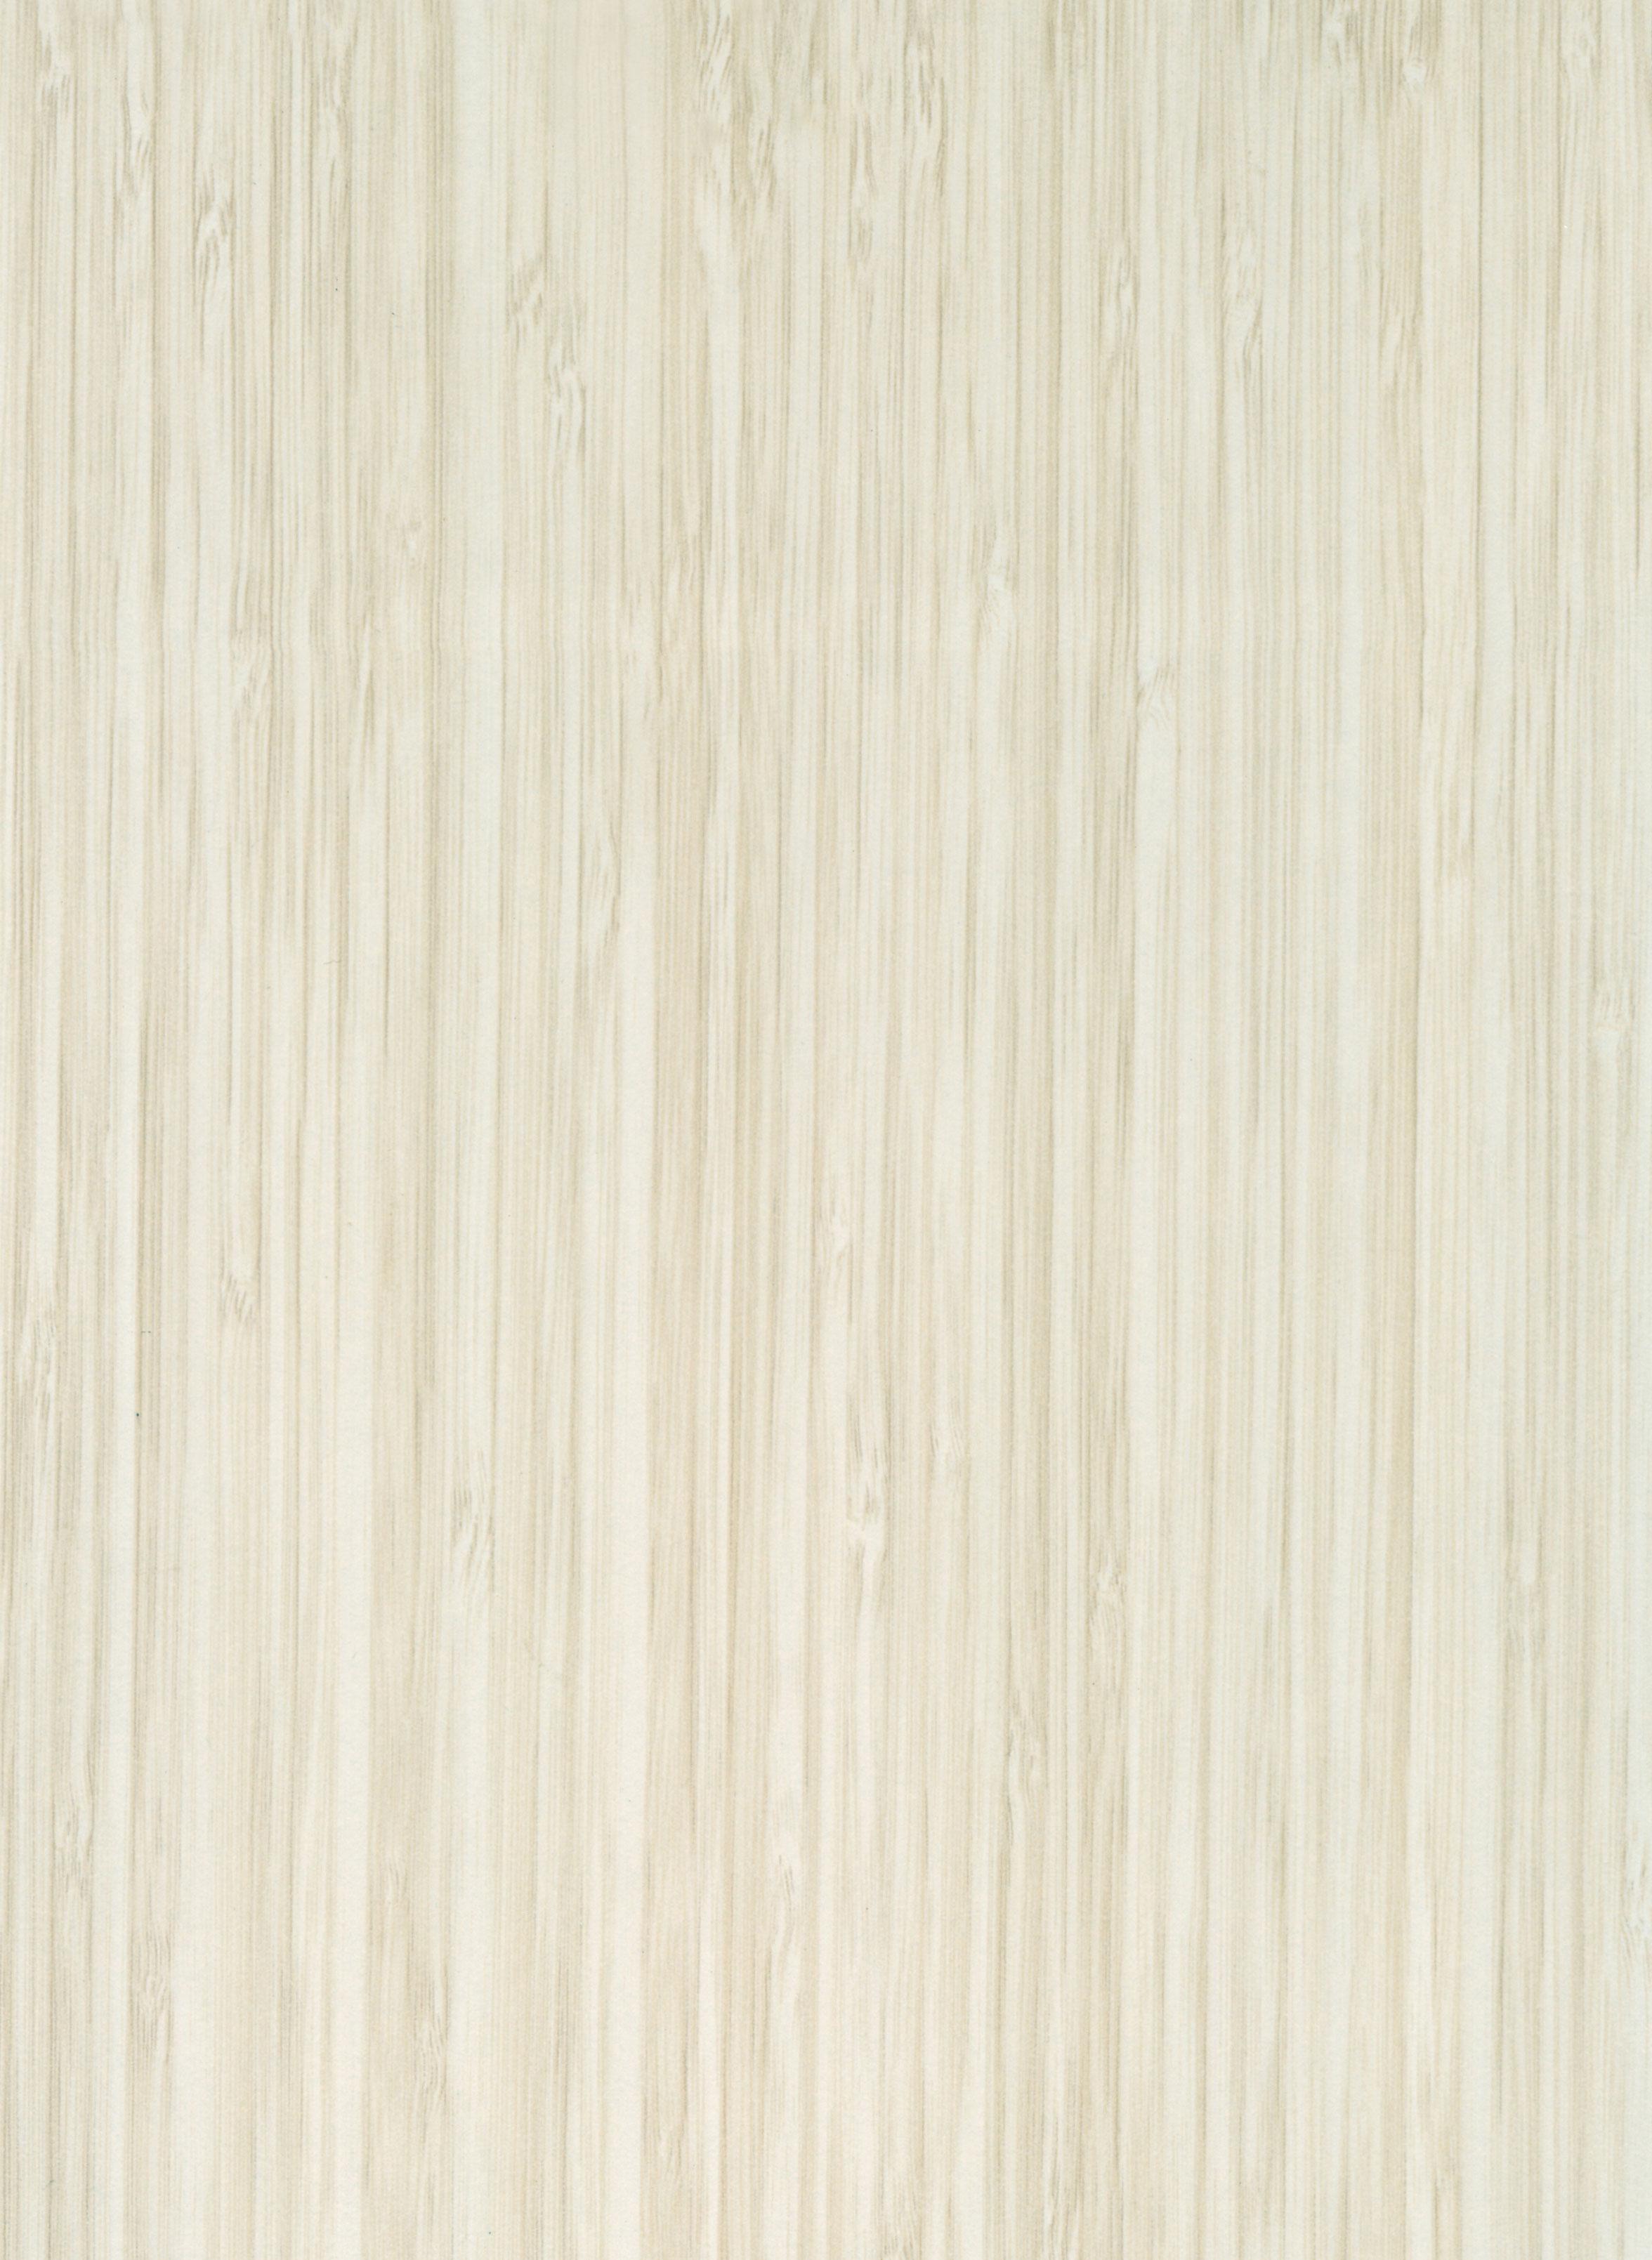 EWE 8329 S - R. Lite Bamboo Woodgrain High Pressure Laminate (hpl)